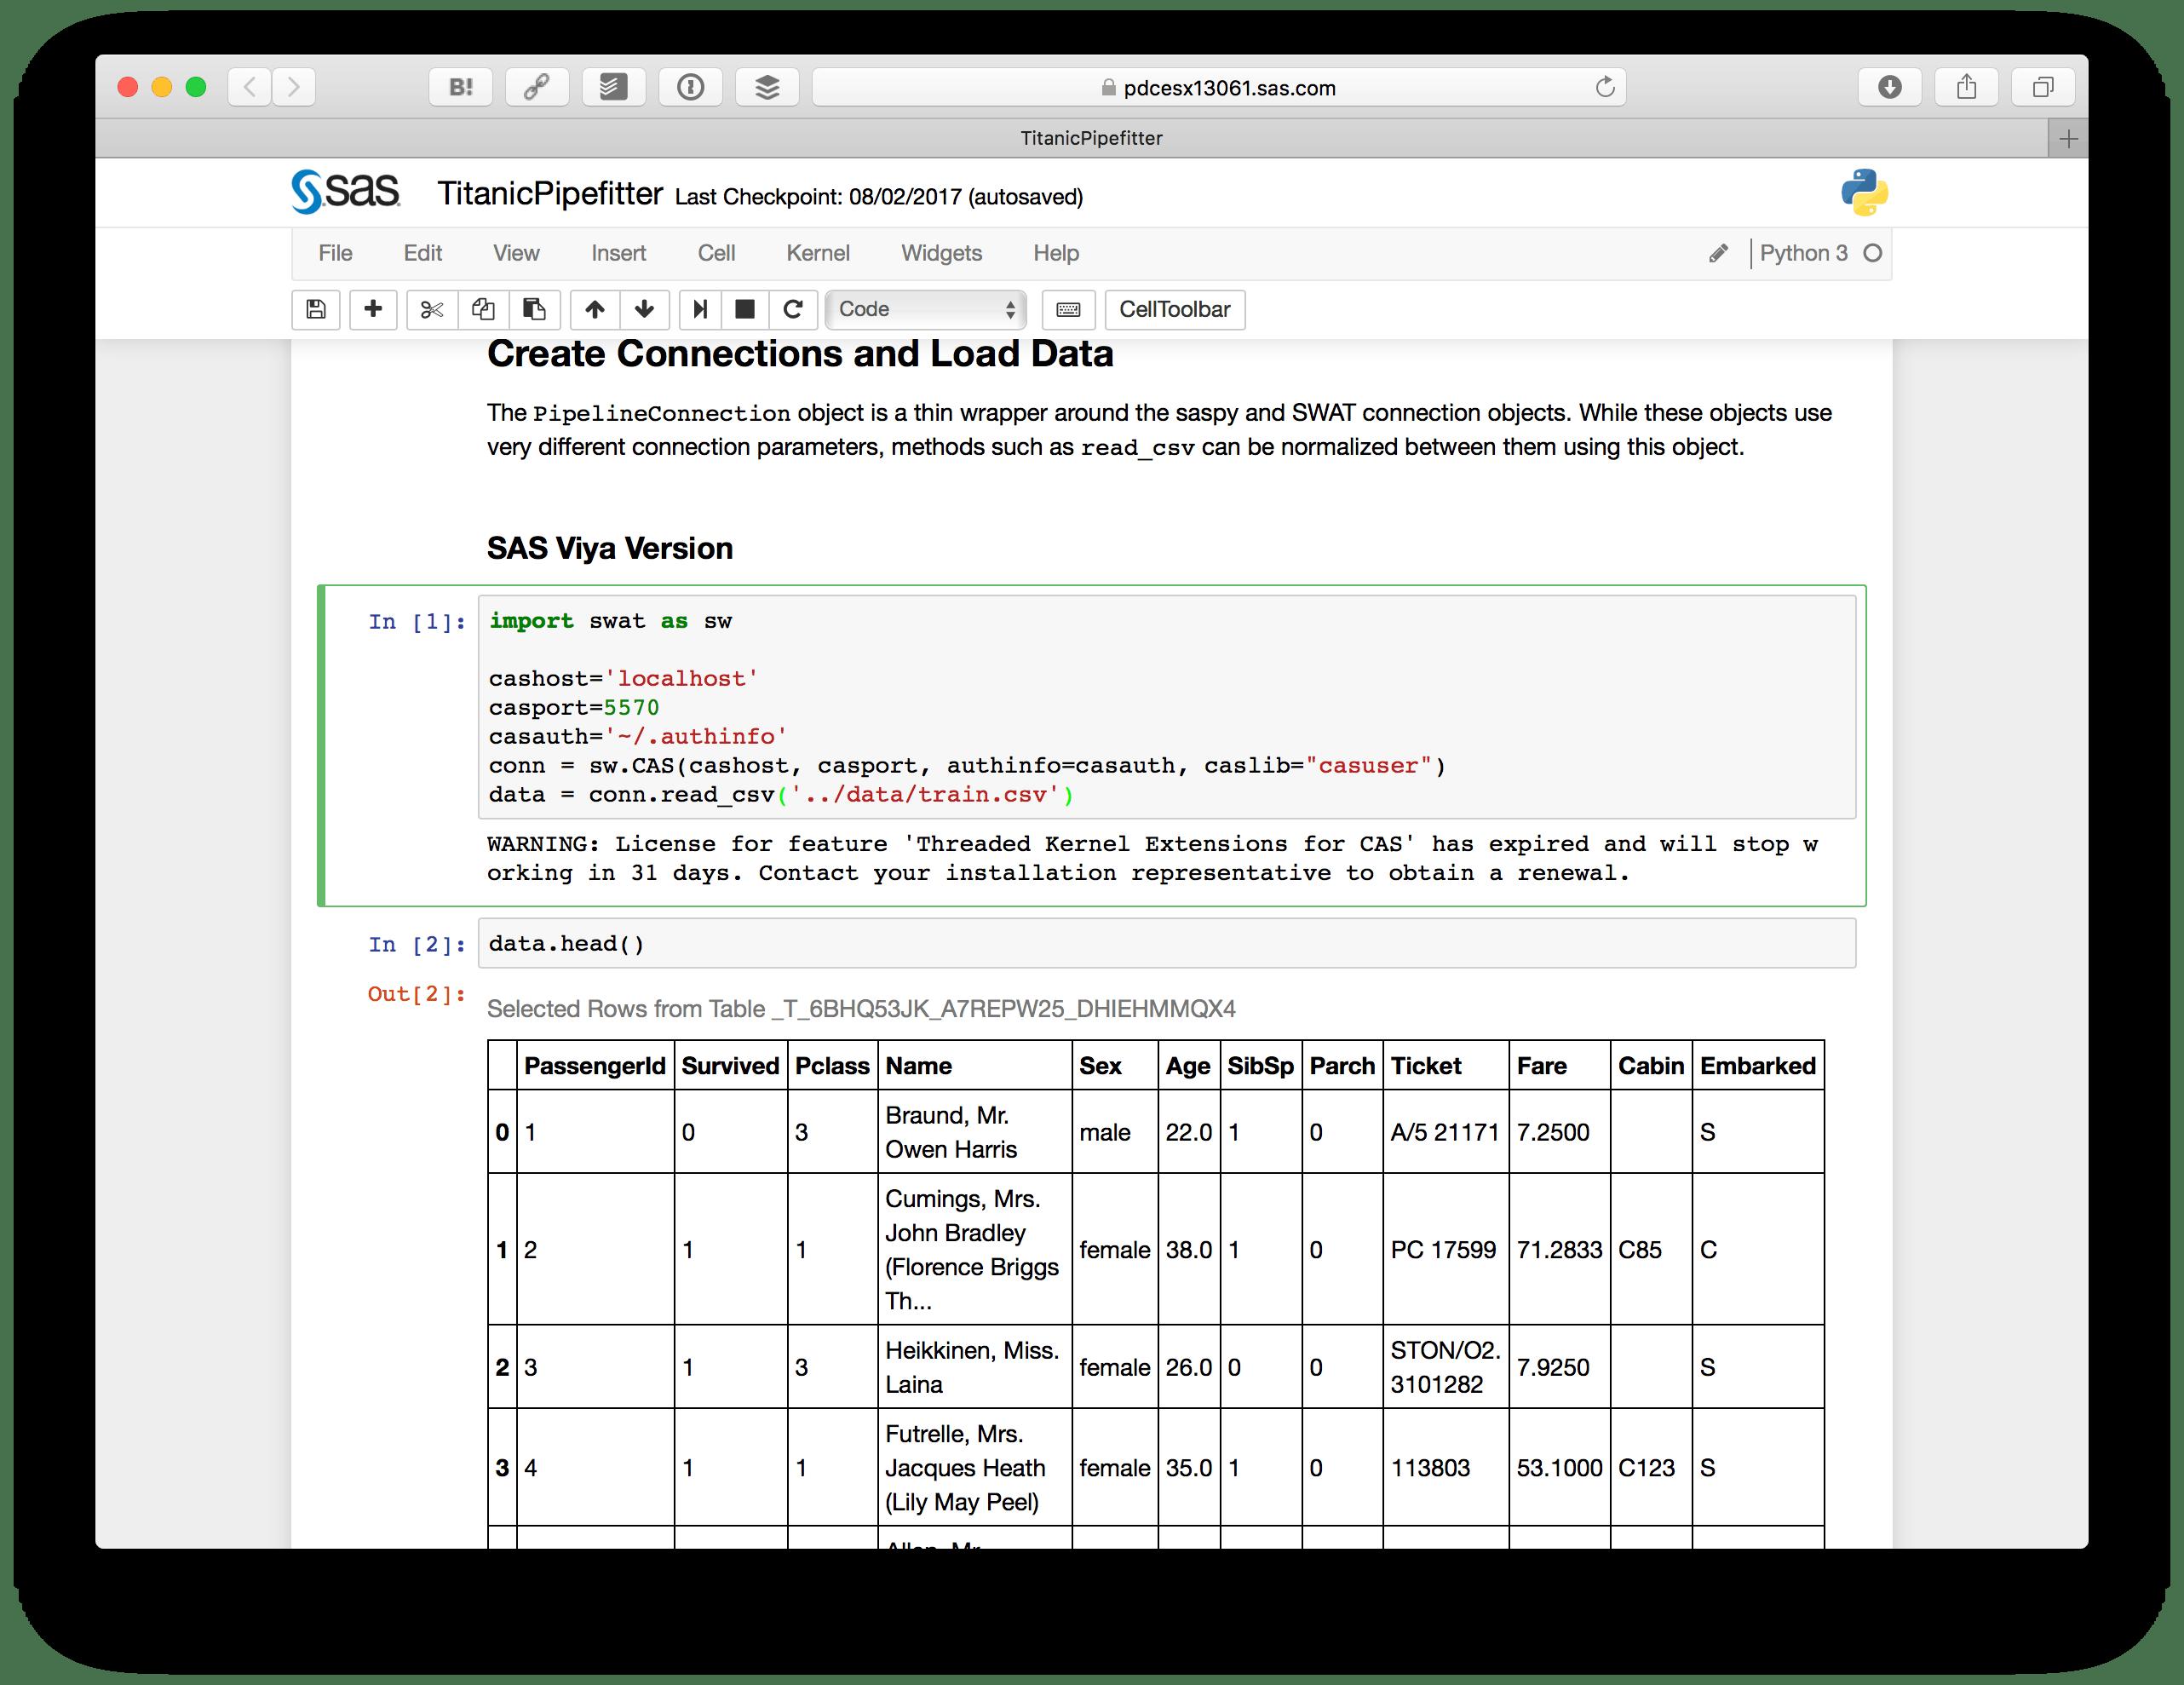 Screenshot_ 2018-05-24 15.40.18.png